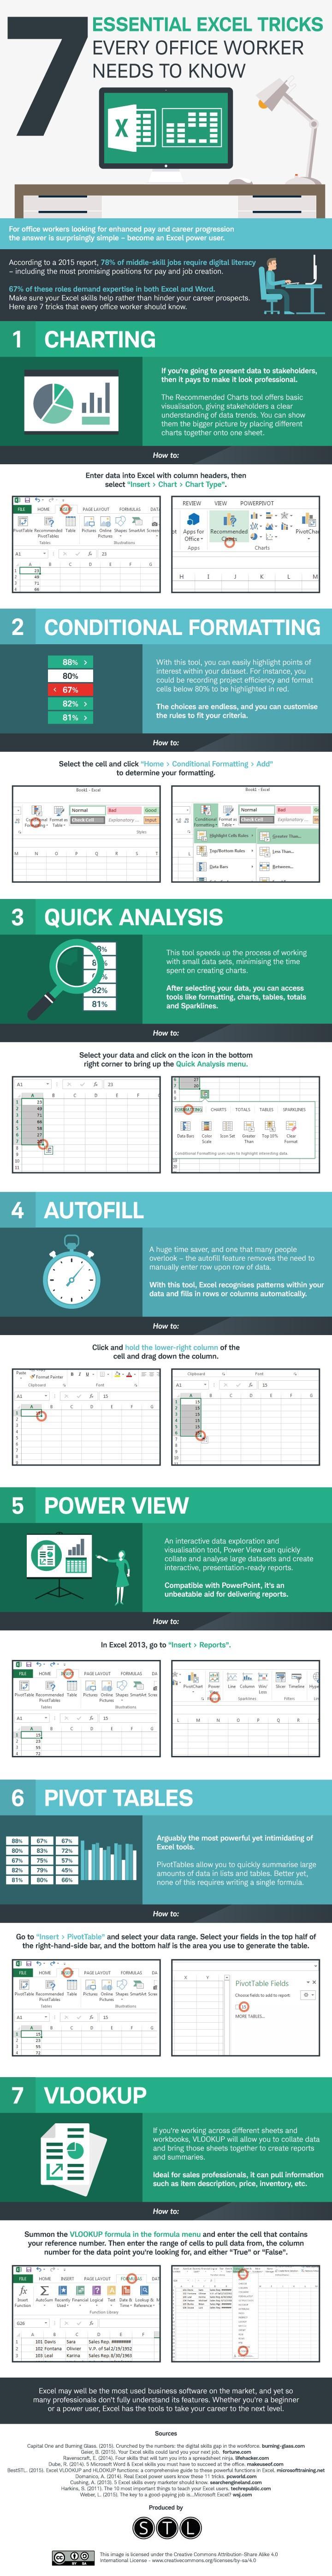 Excel tricks infographic